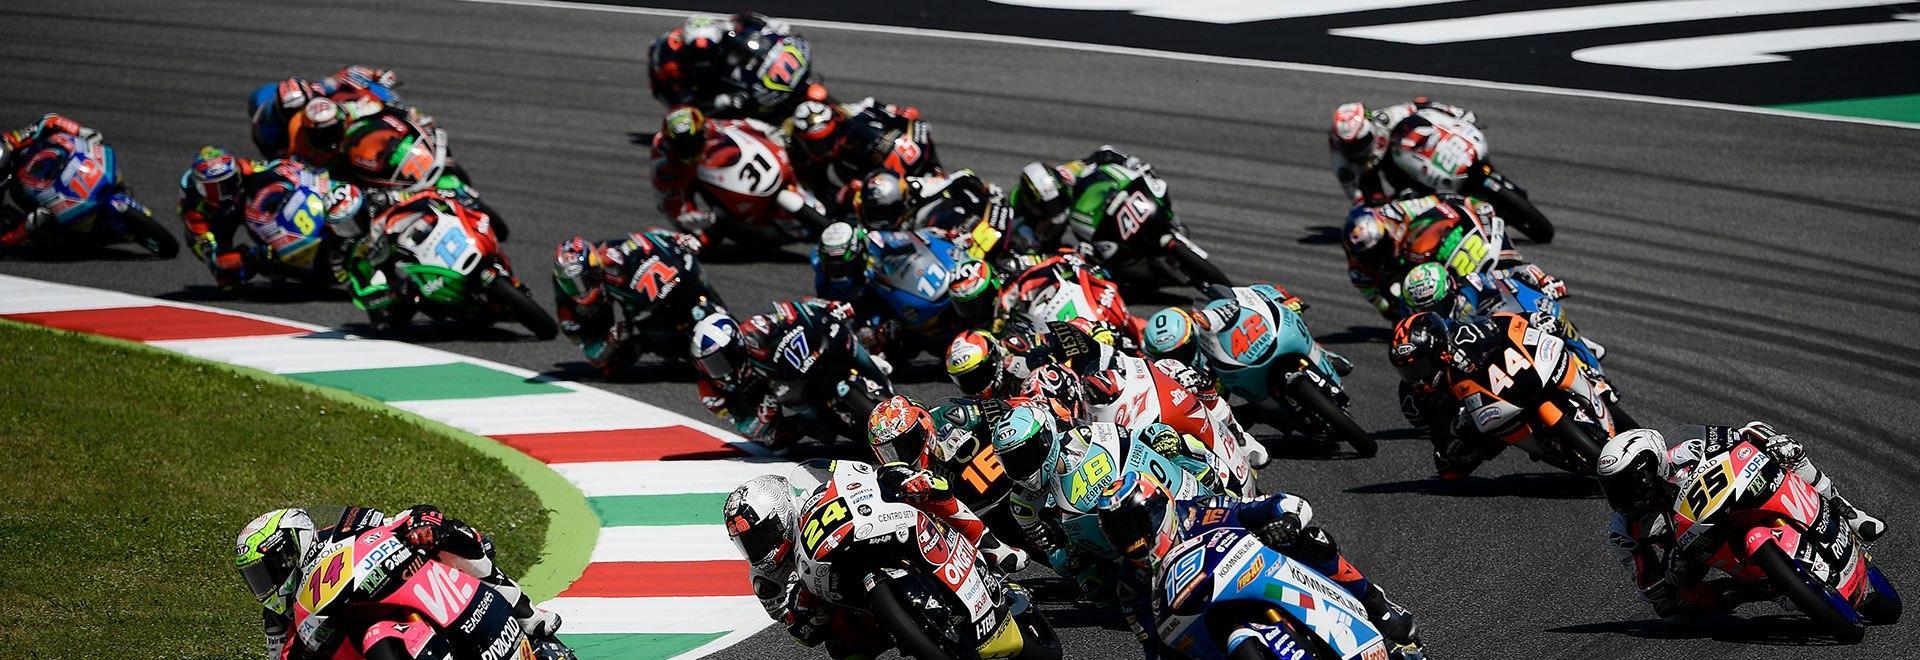 Superbike Misano. Race 2